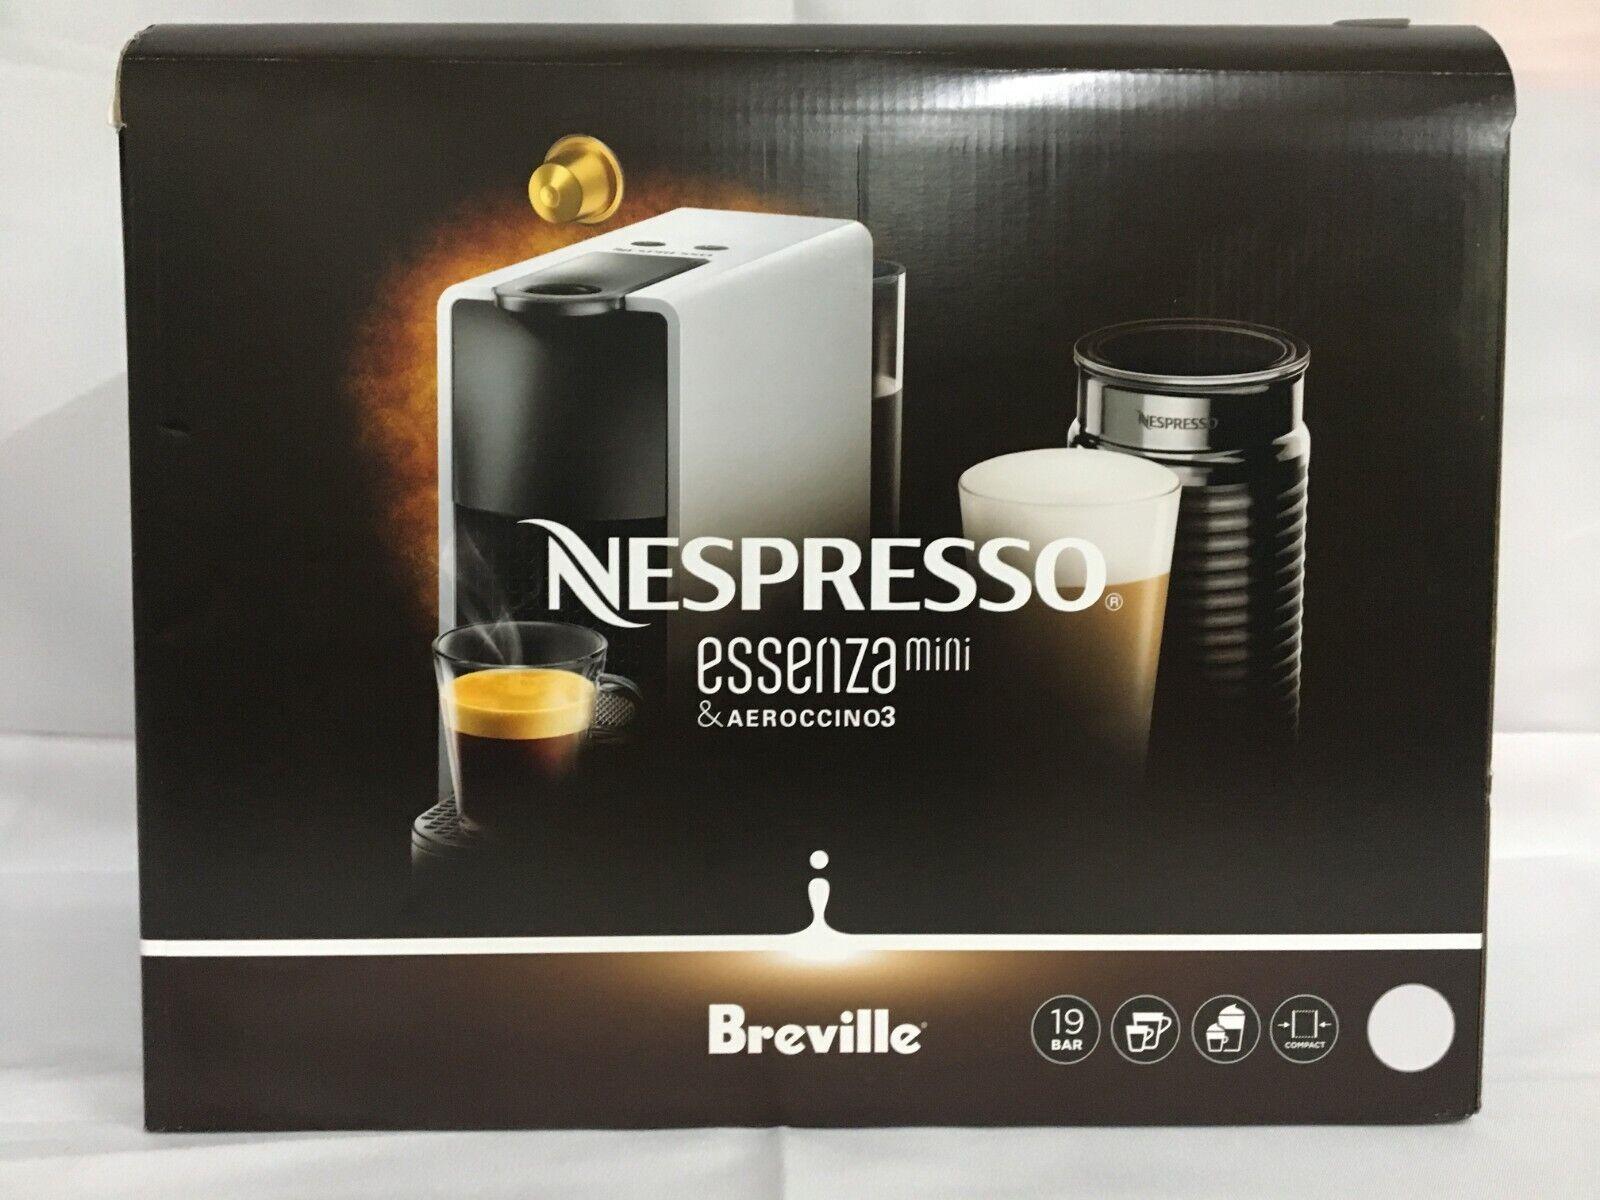 Nespresso Essenza Mini Original Espresso Machine Bundle with